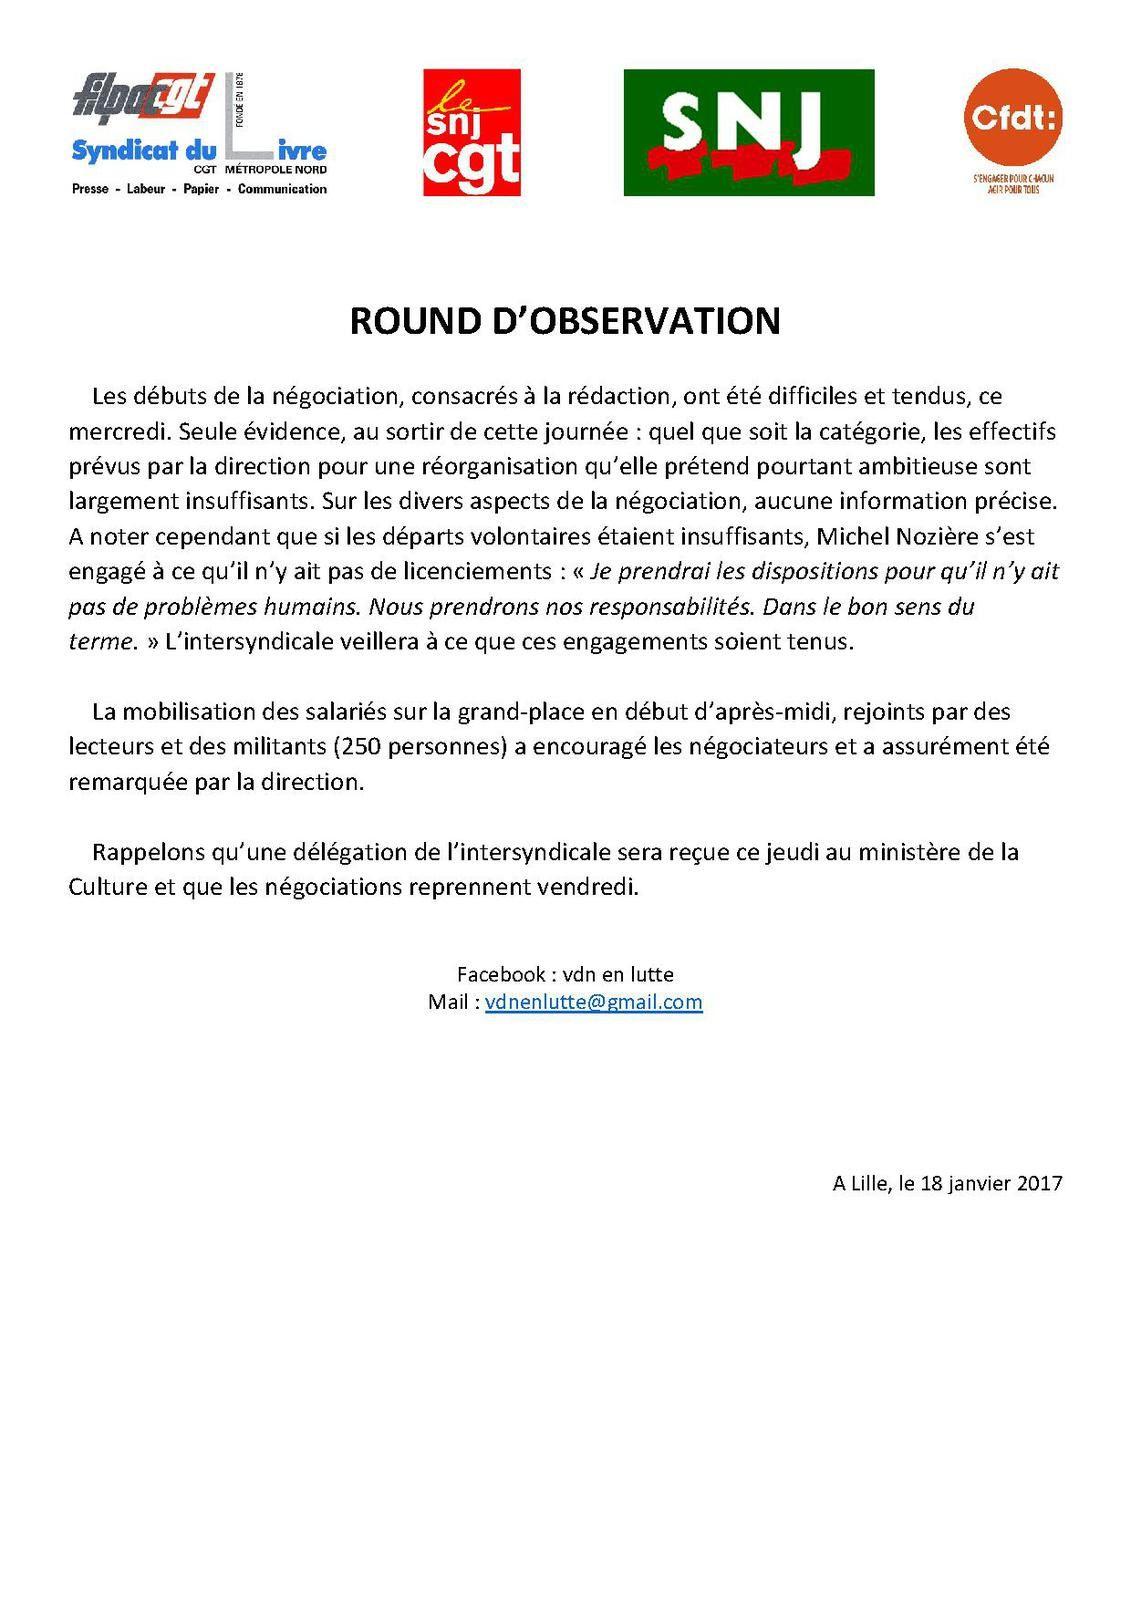 ROUND D'OBSERVATION (Intersyndicale VDN)